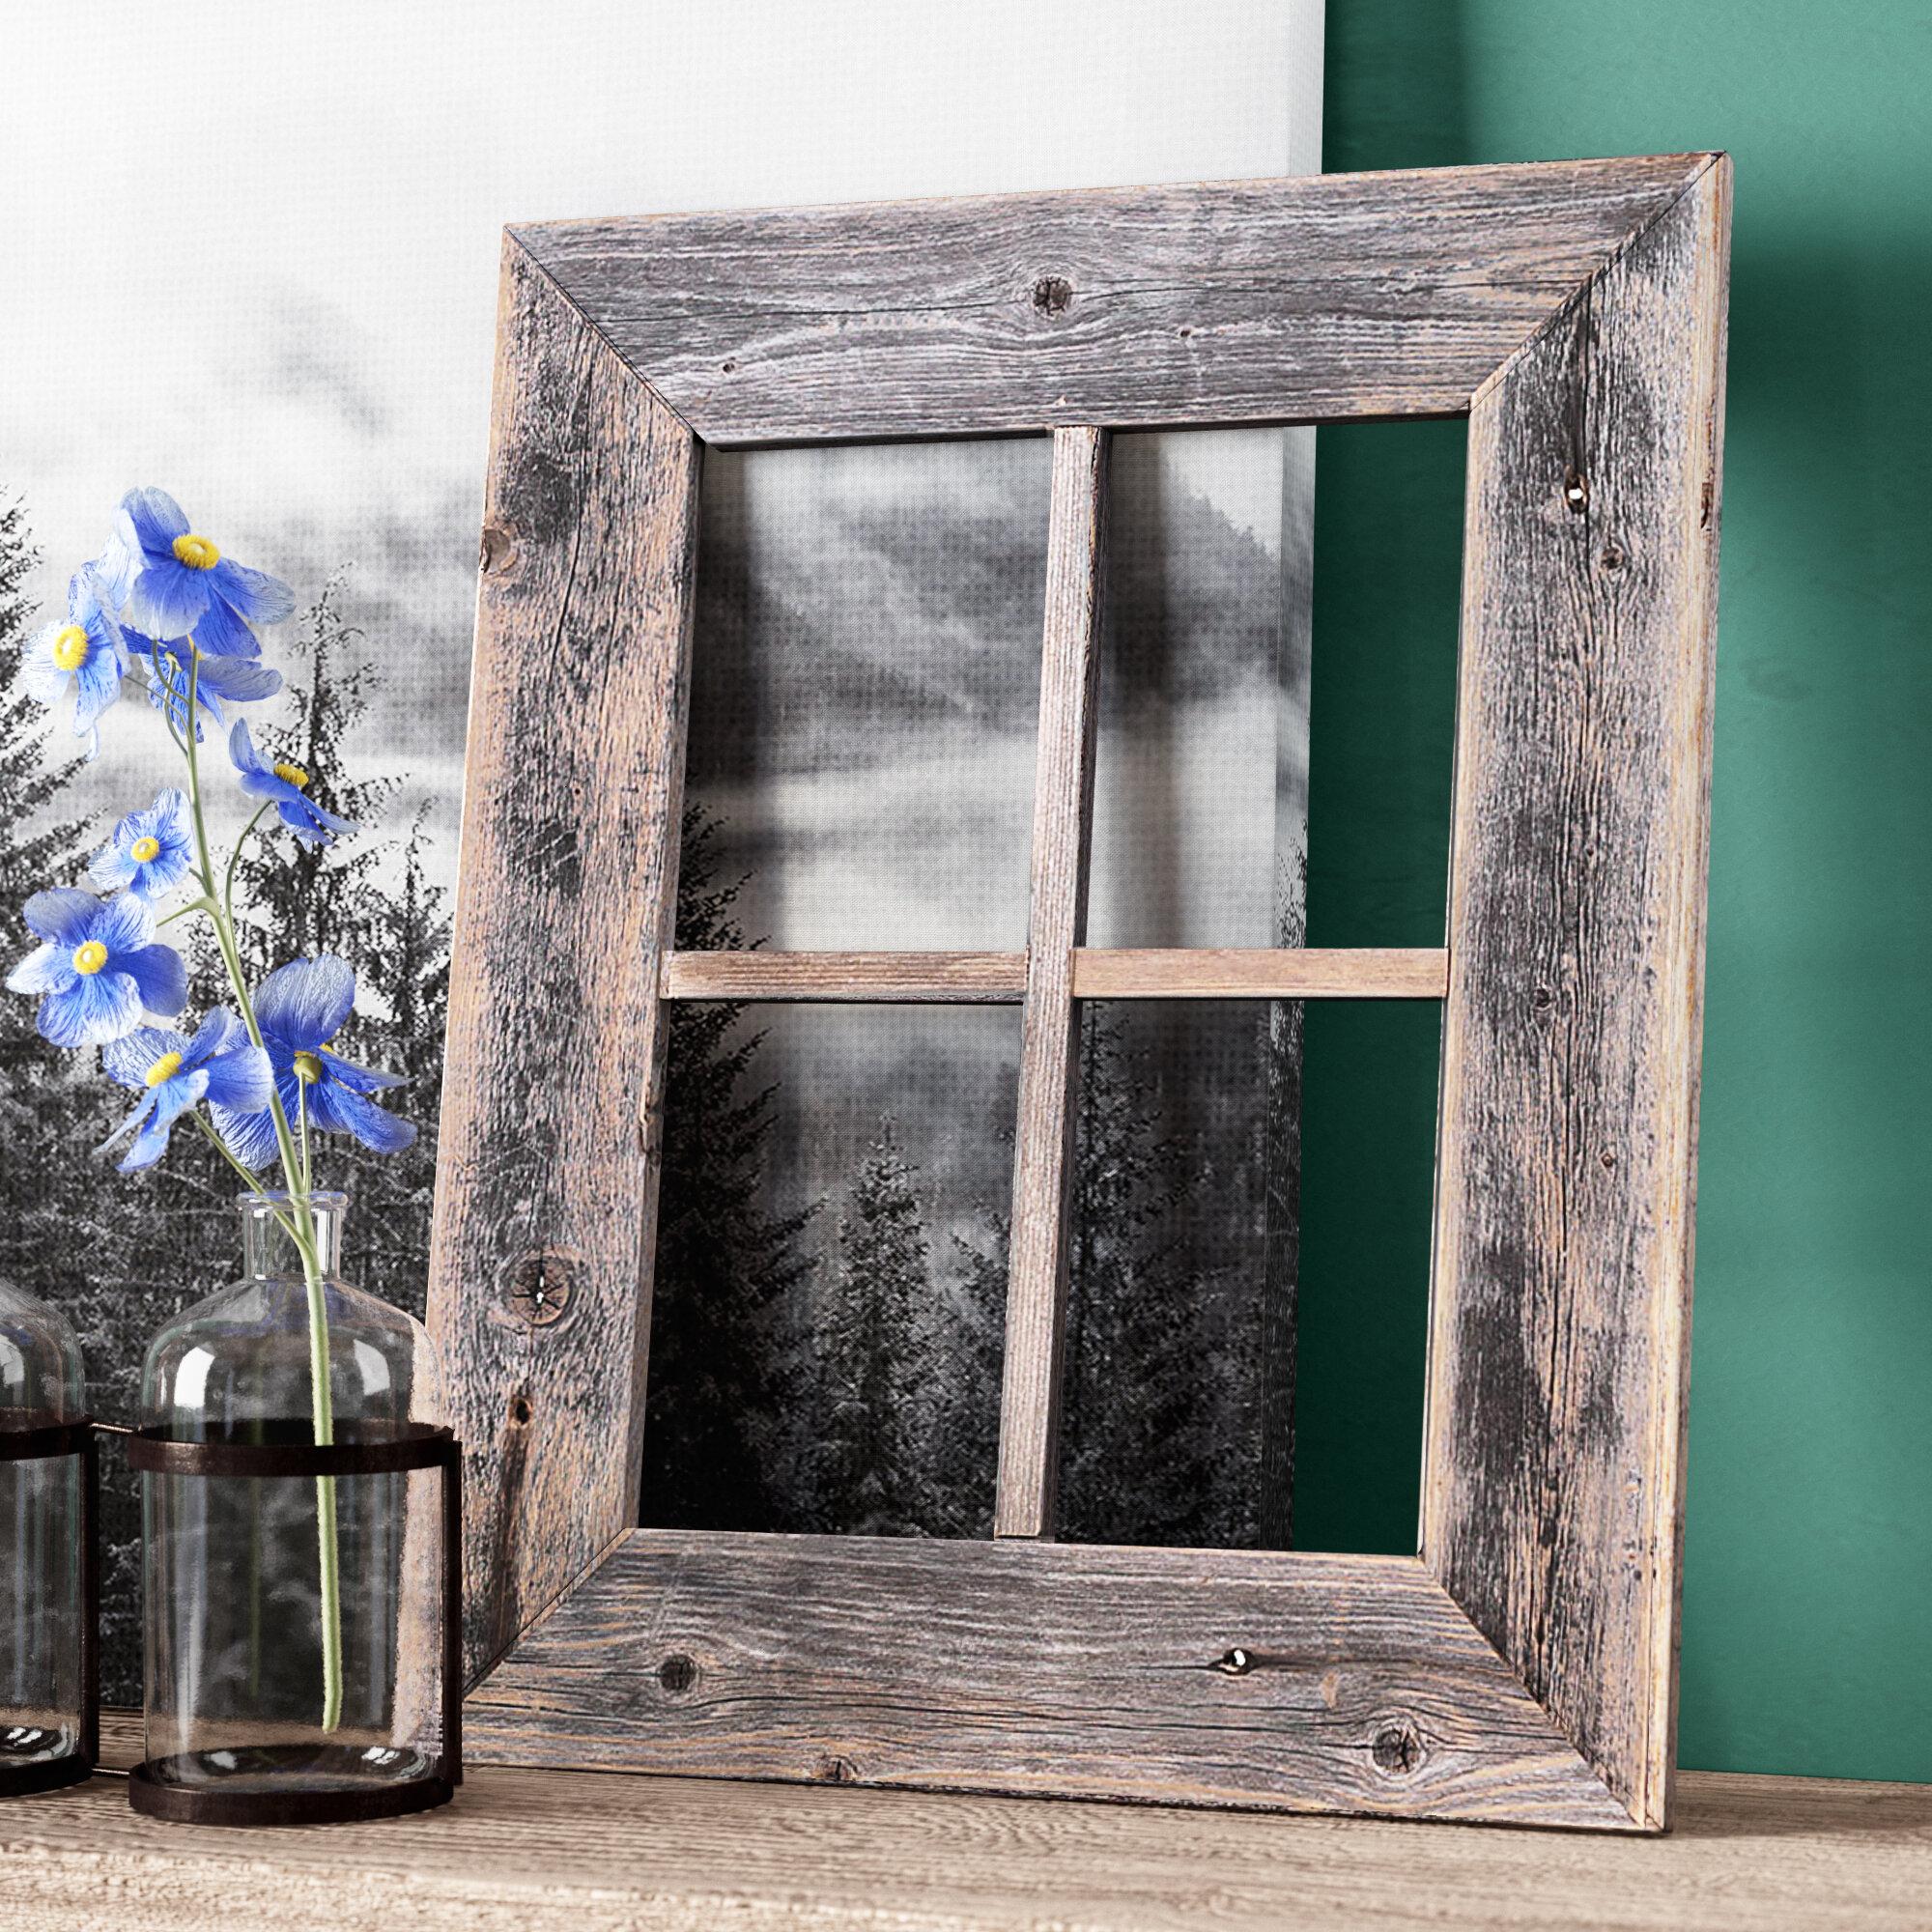 3970e19fad069 Old Rustic Barn Window Frame Wall Décor